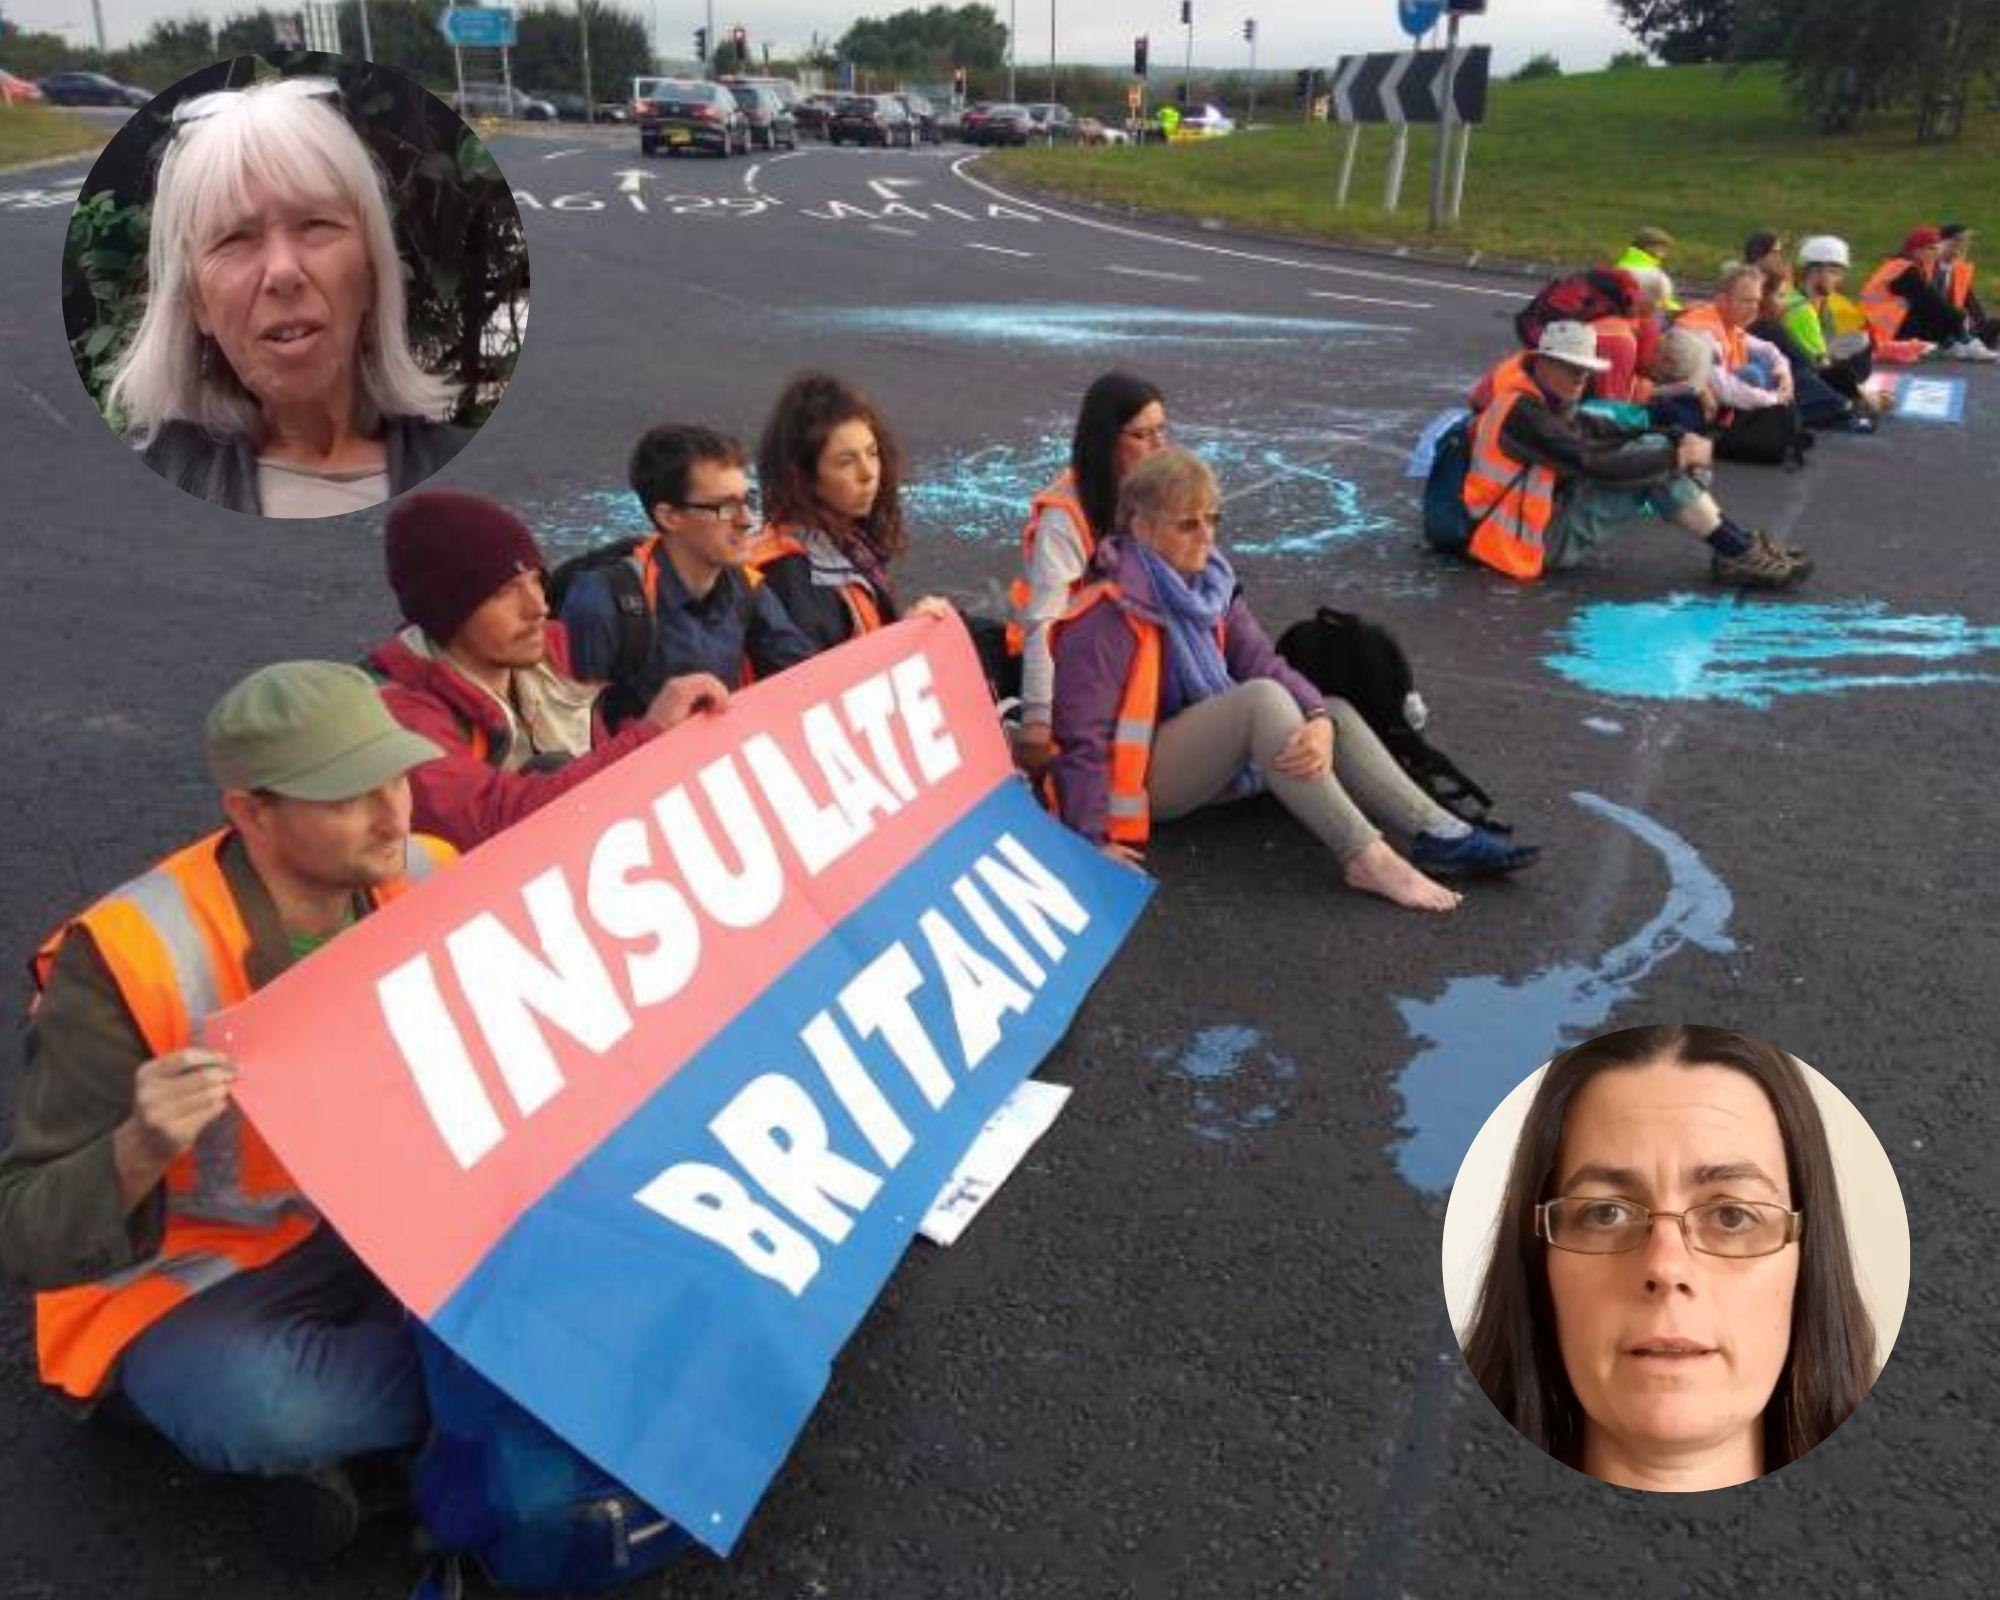 South Lakes protestors block traffic again on M25